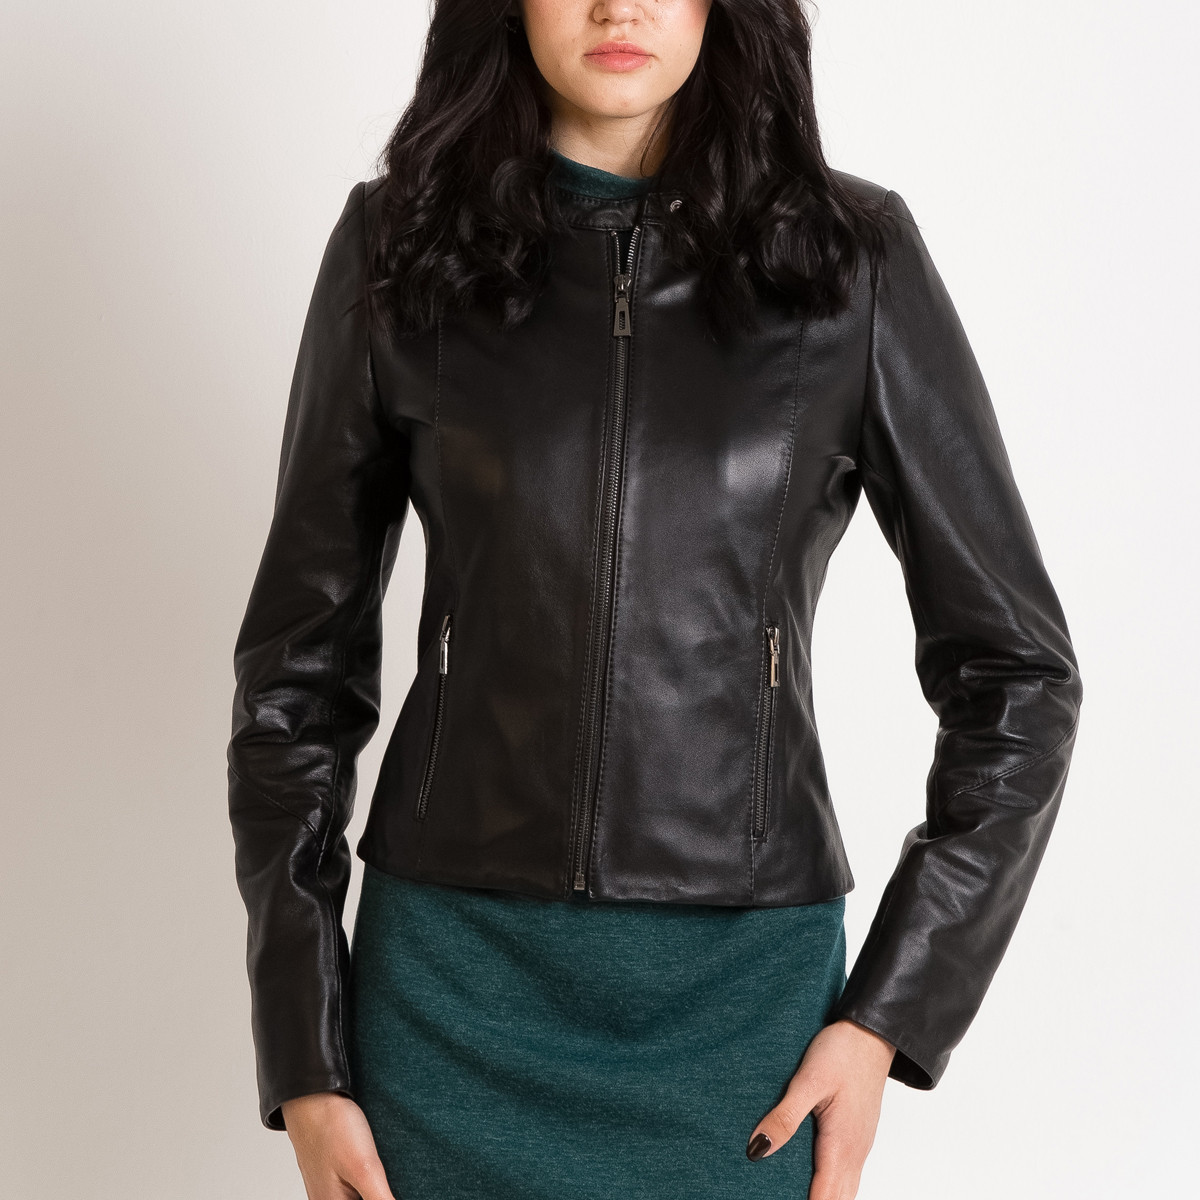 Кожаная куртка женская VK черная короткая (Арт.TF201) 50